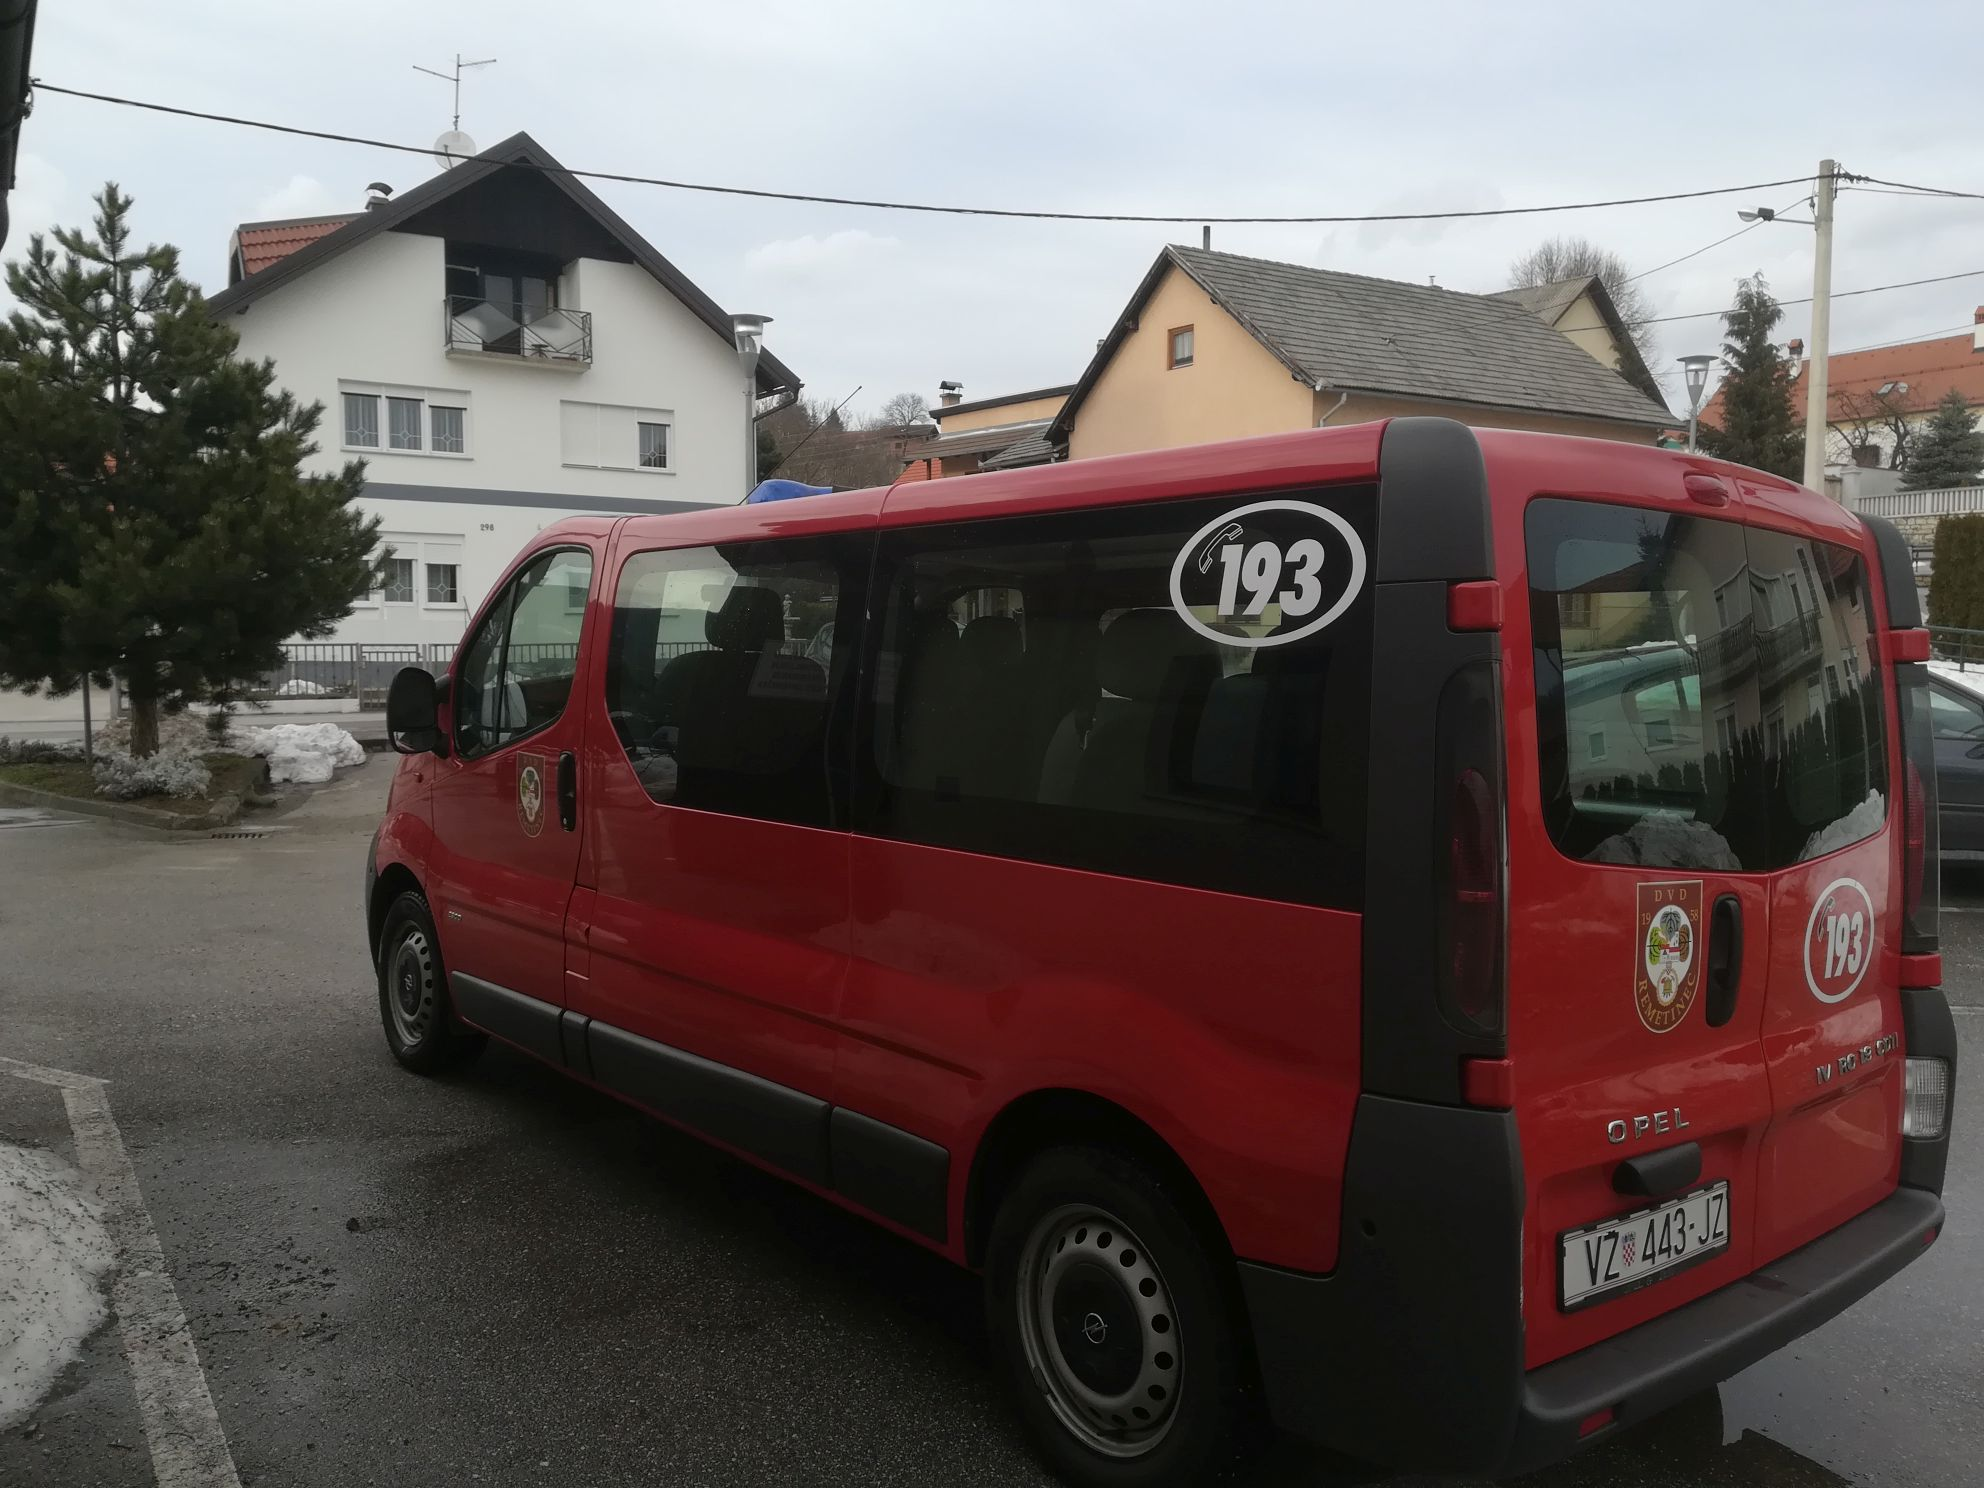 MALI OGLASI: Vatrogasno kombi vozilo Opel Vivaro